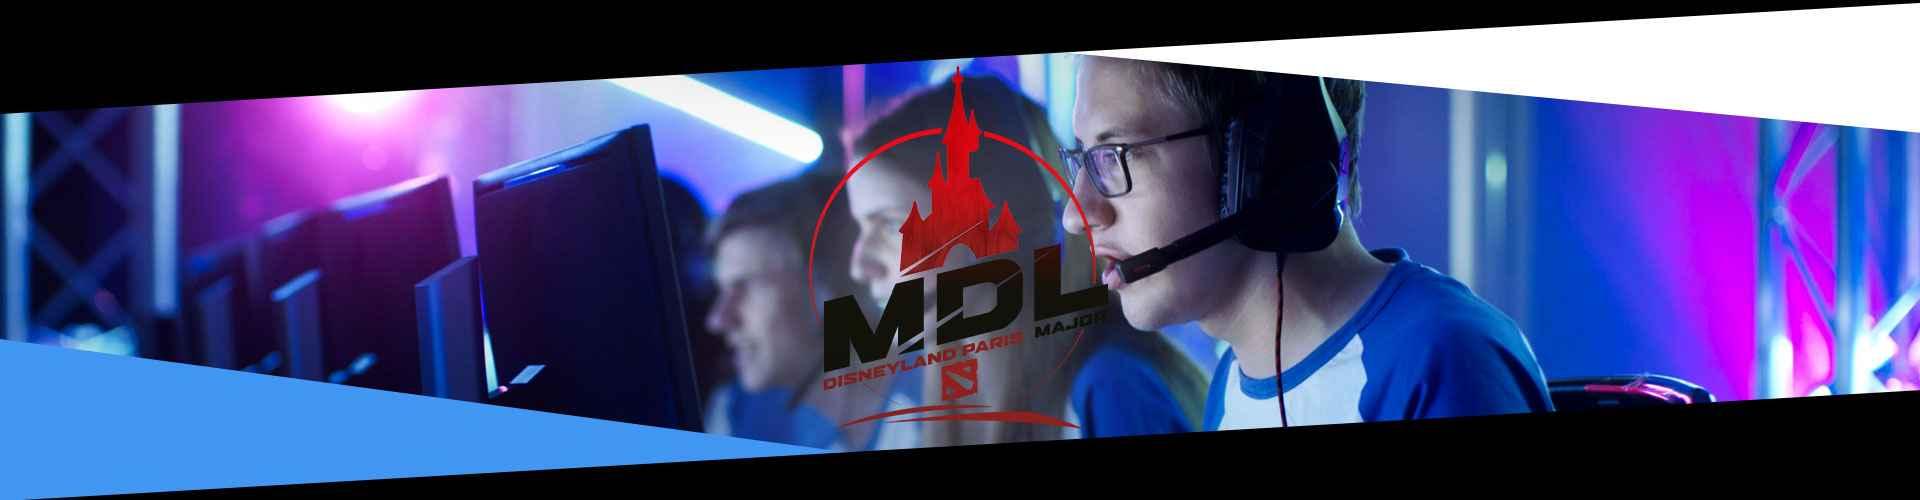 Dota 2 - MDL Disneyland Paris Major